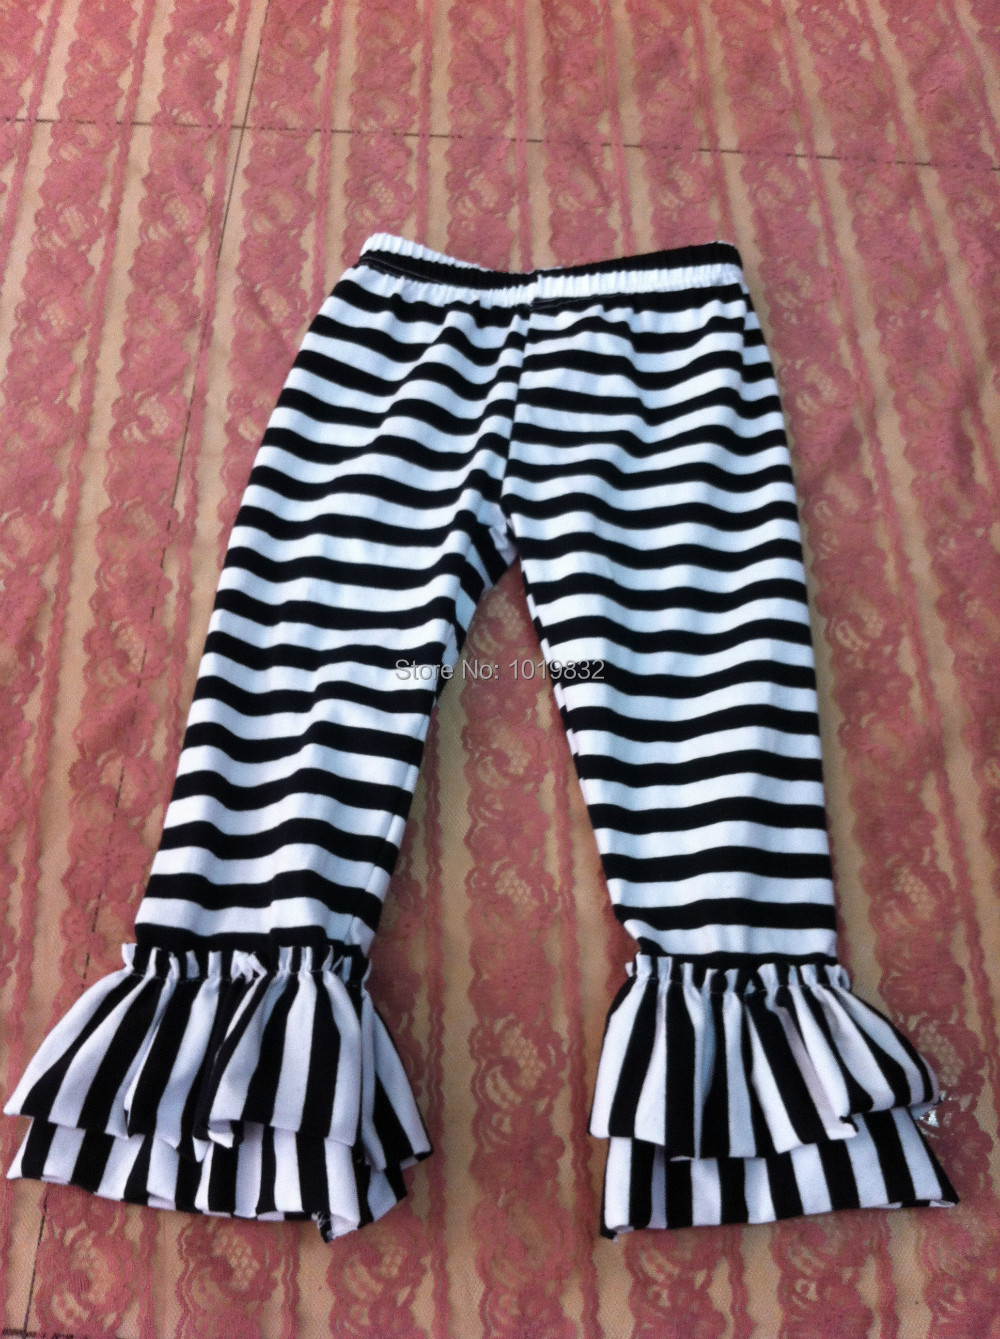 6d07bff55edb97 Kids Leggings Girls Black/White Stripe Ruffle Pants Leggings-in Pants from  Mother & Kids on Aliexpress.com | Alibaba Group